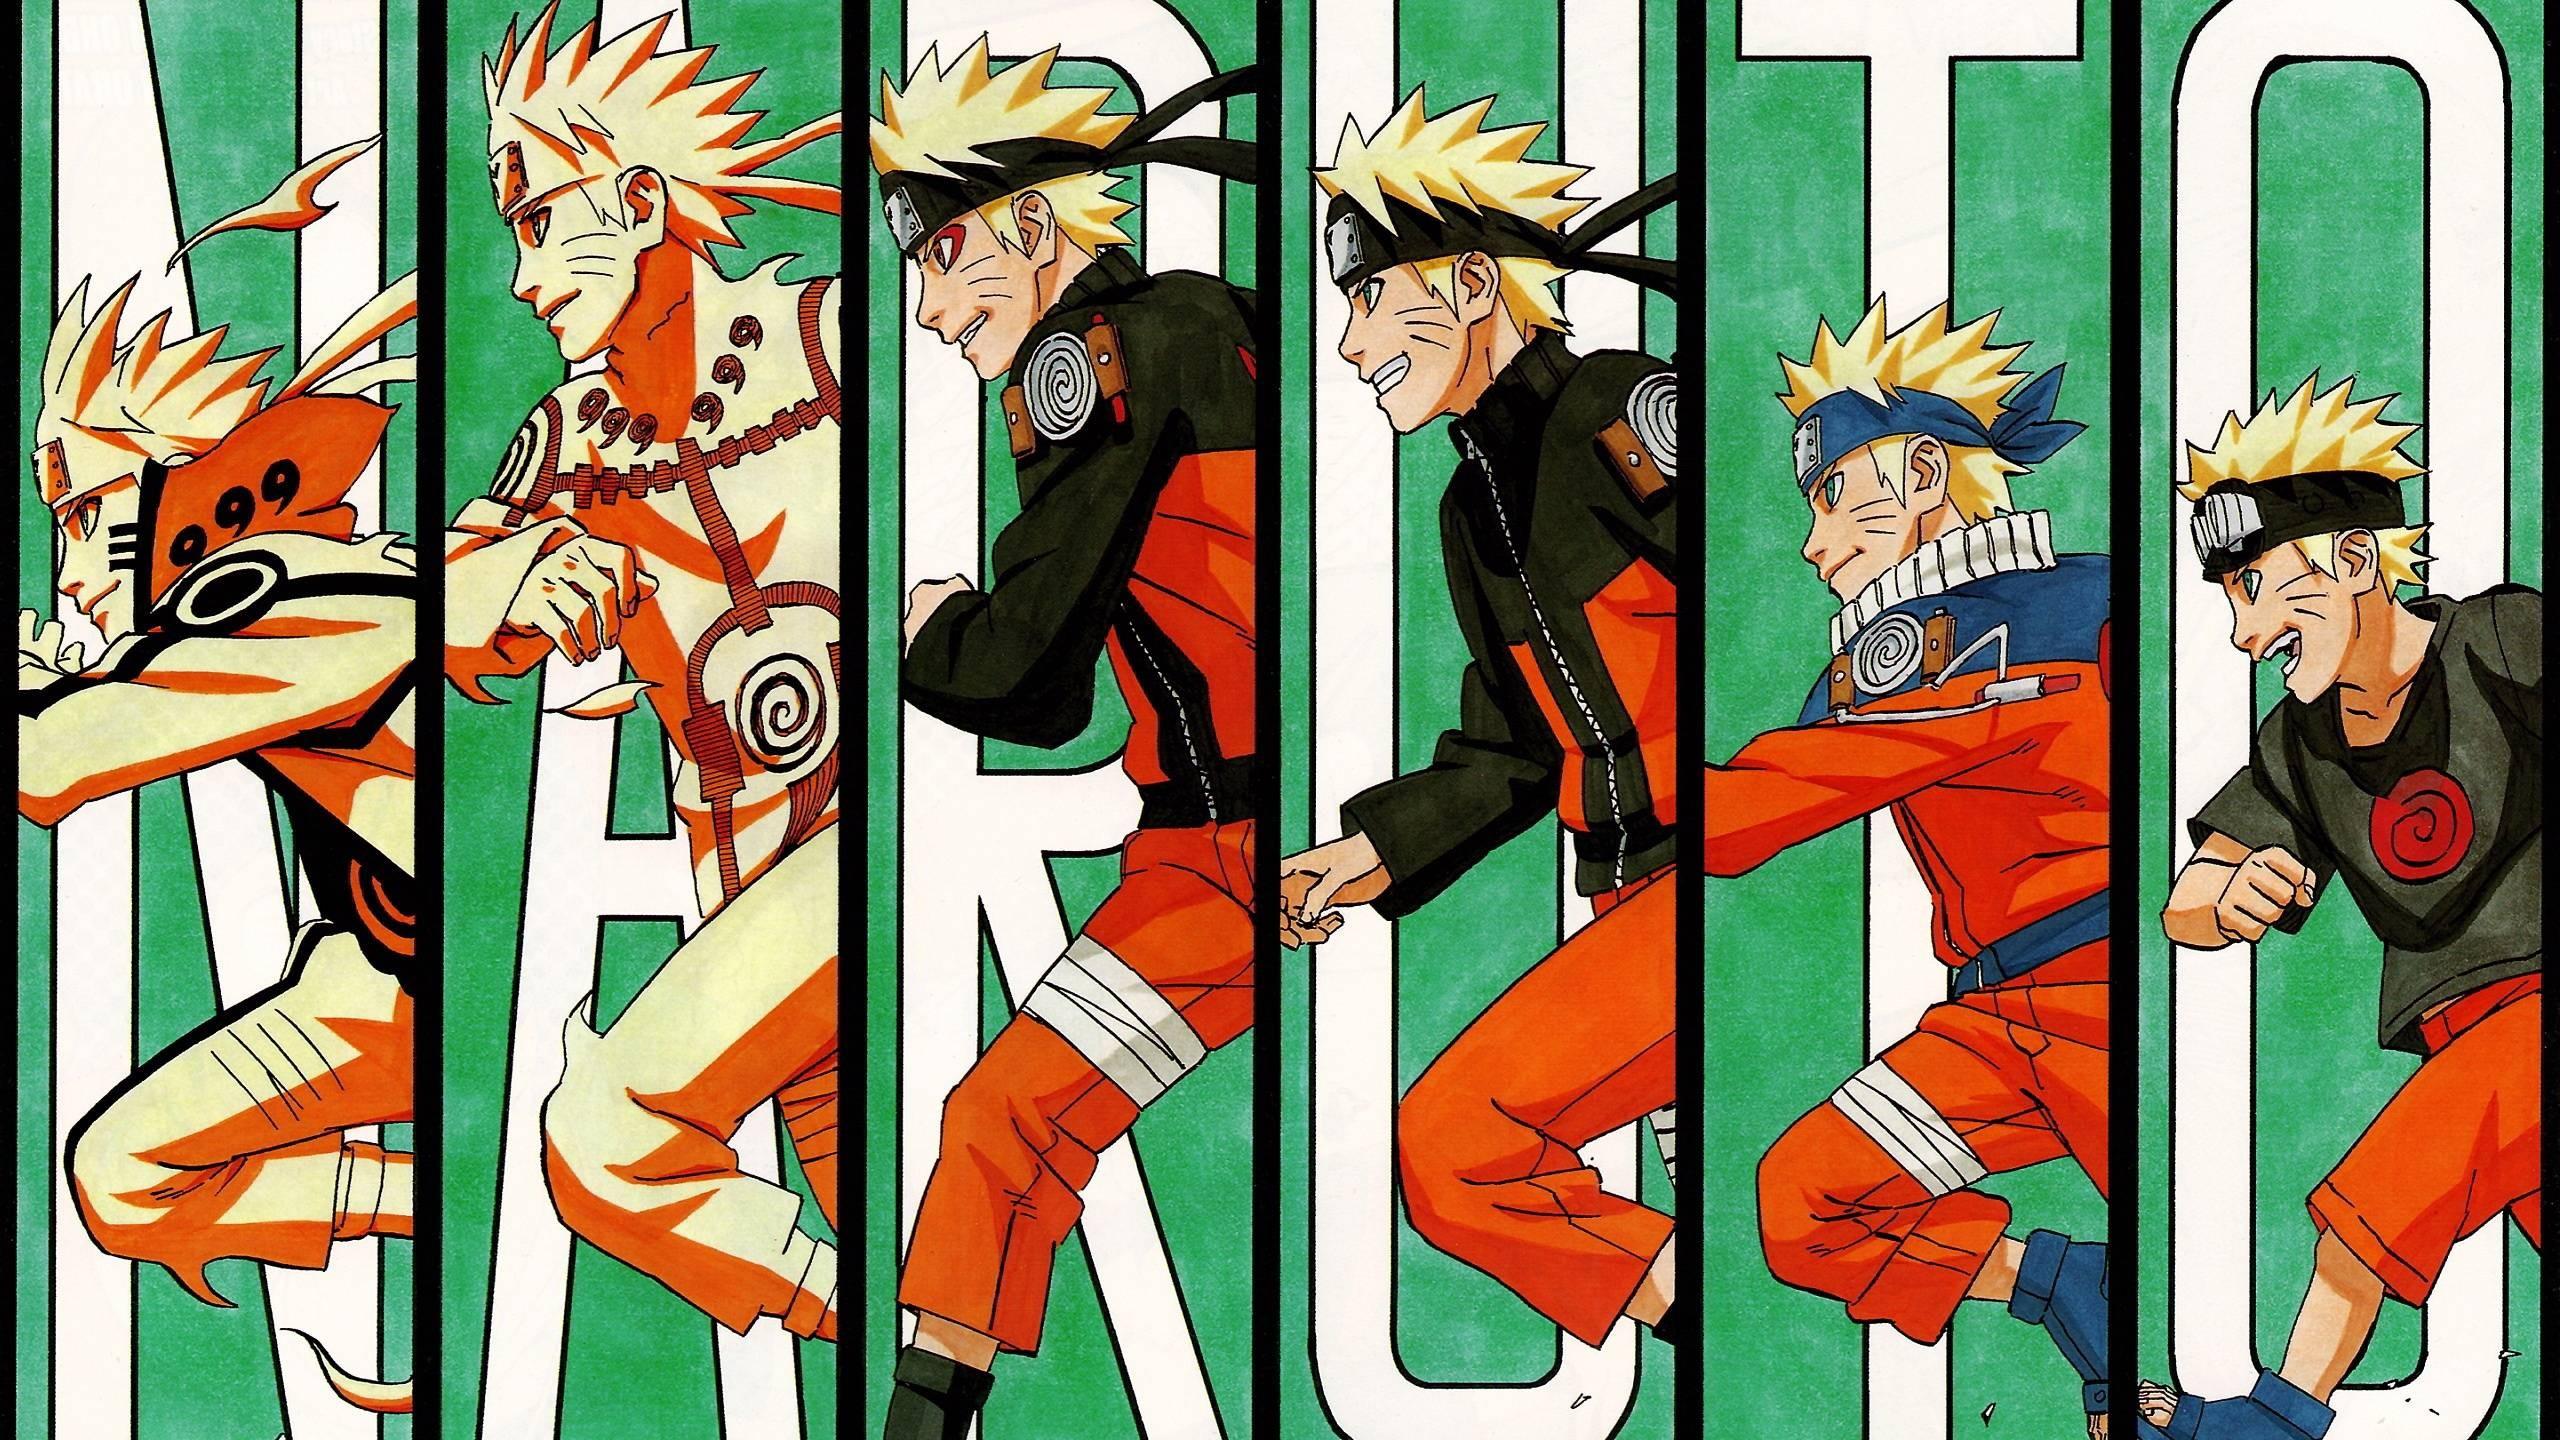 Popular Wallpaper Mac Naruto - illustration-window-anime-cartoon-Naruto-Shippuuden-comics-poster-ART-boy-naruto-modern-art-comic-book-574685  Collection_914944.jpg